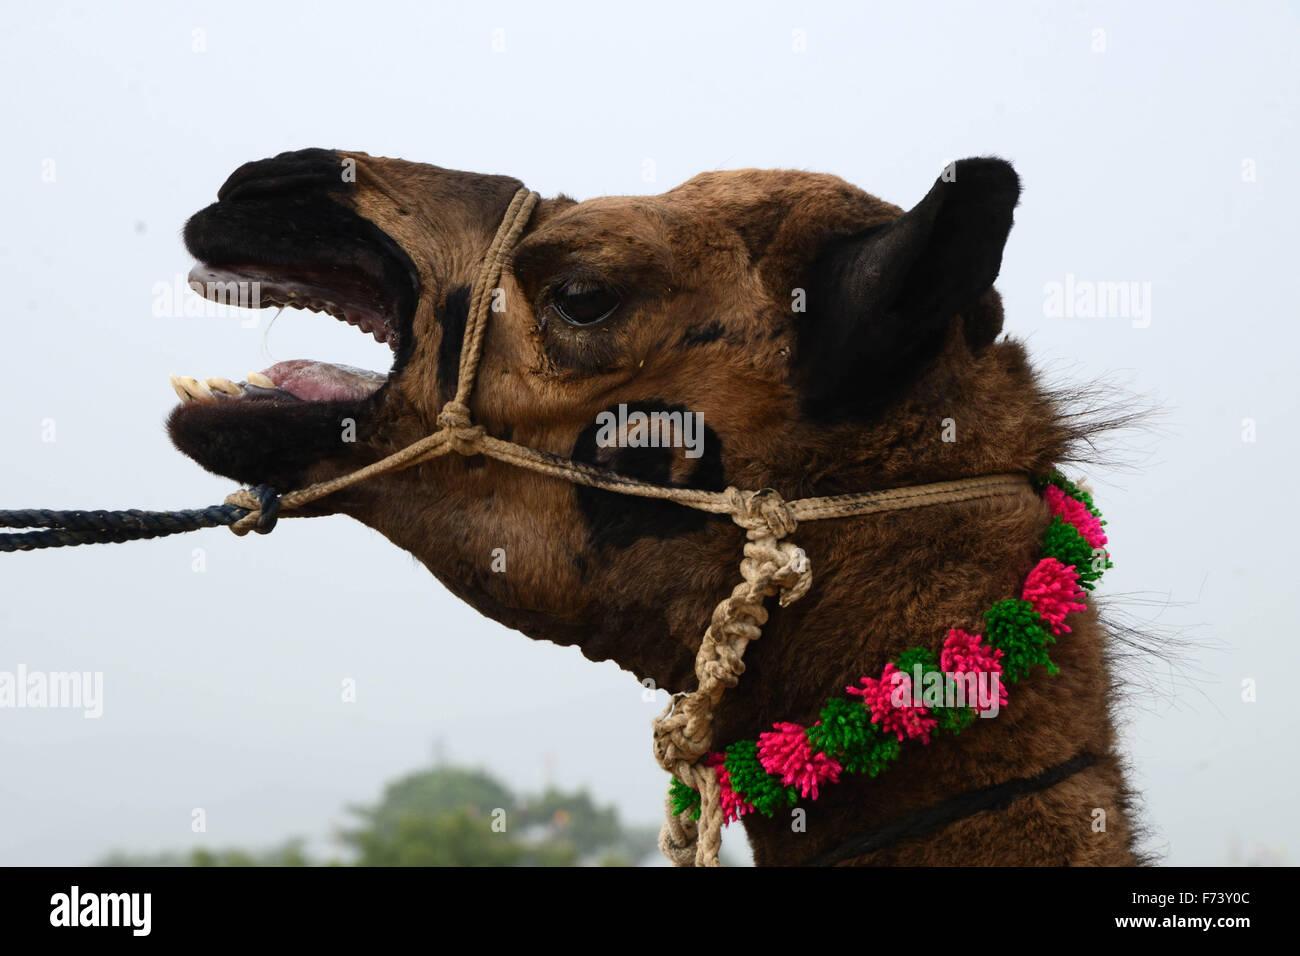 Camel en bétail, pushkar fair, Rajasthan, Inde, Asie Banque D'Images